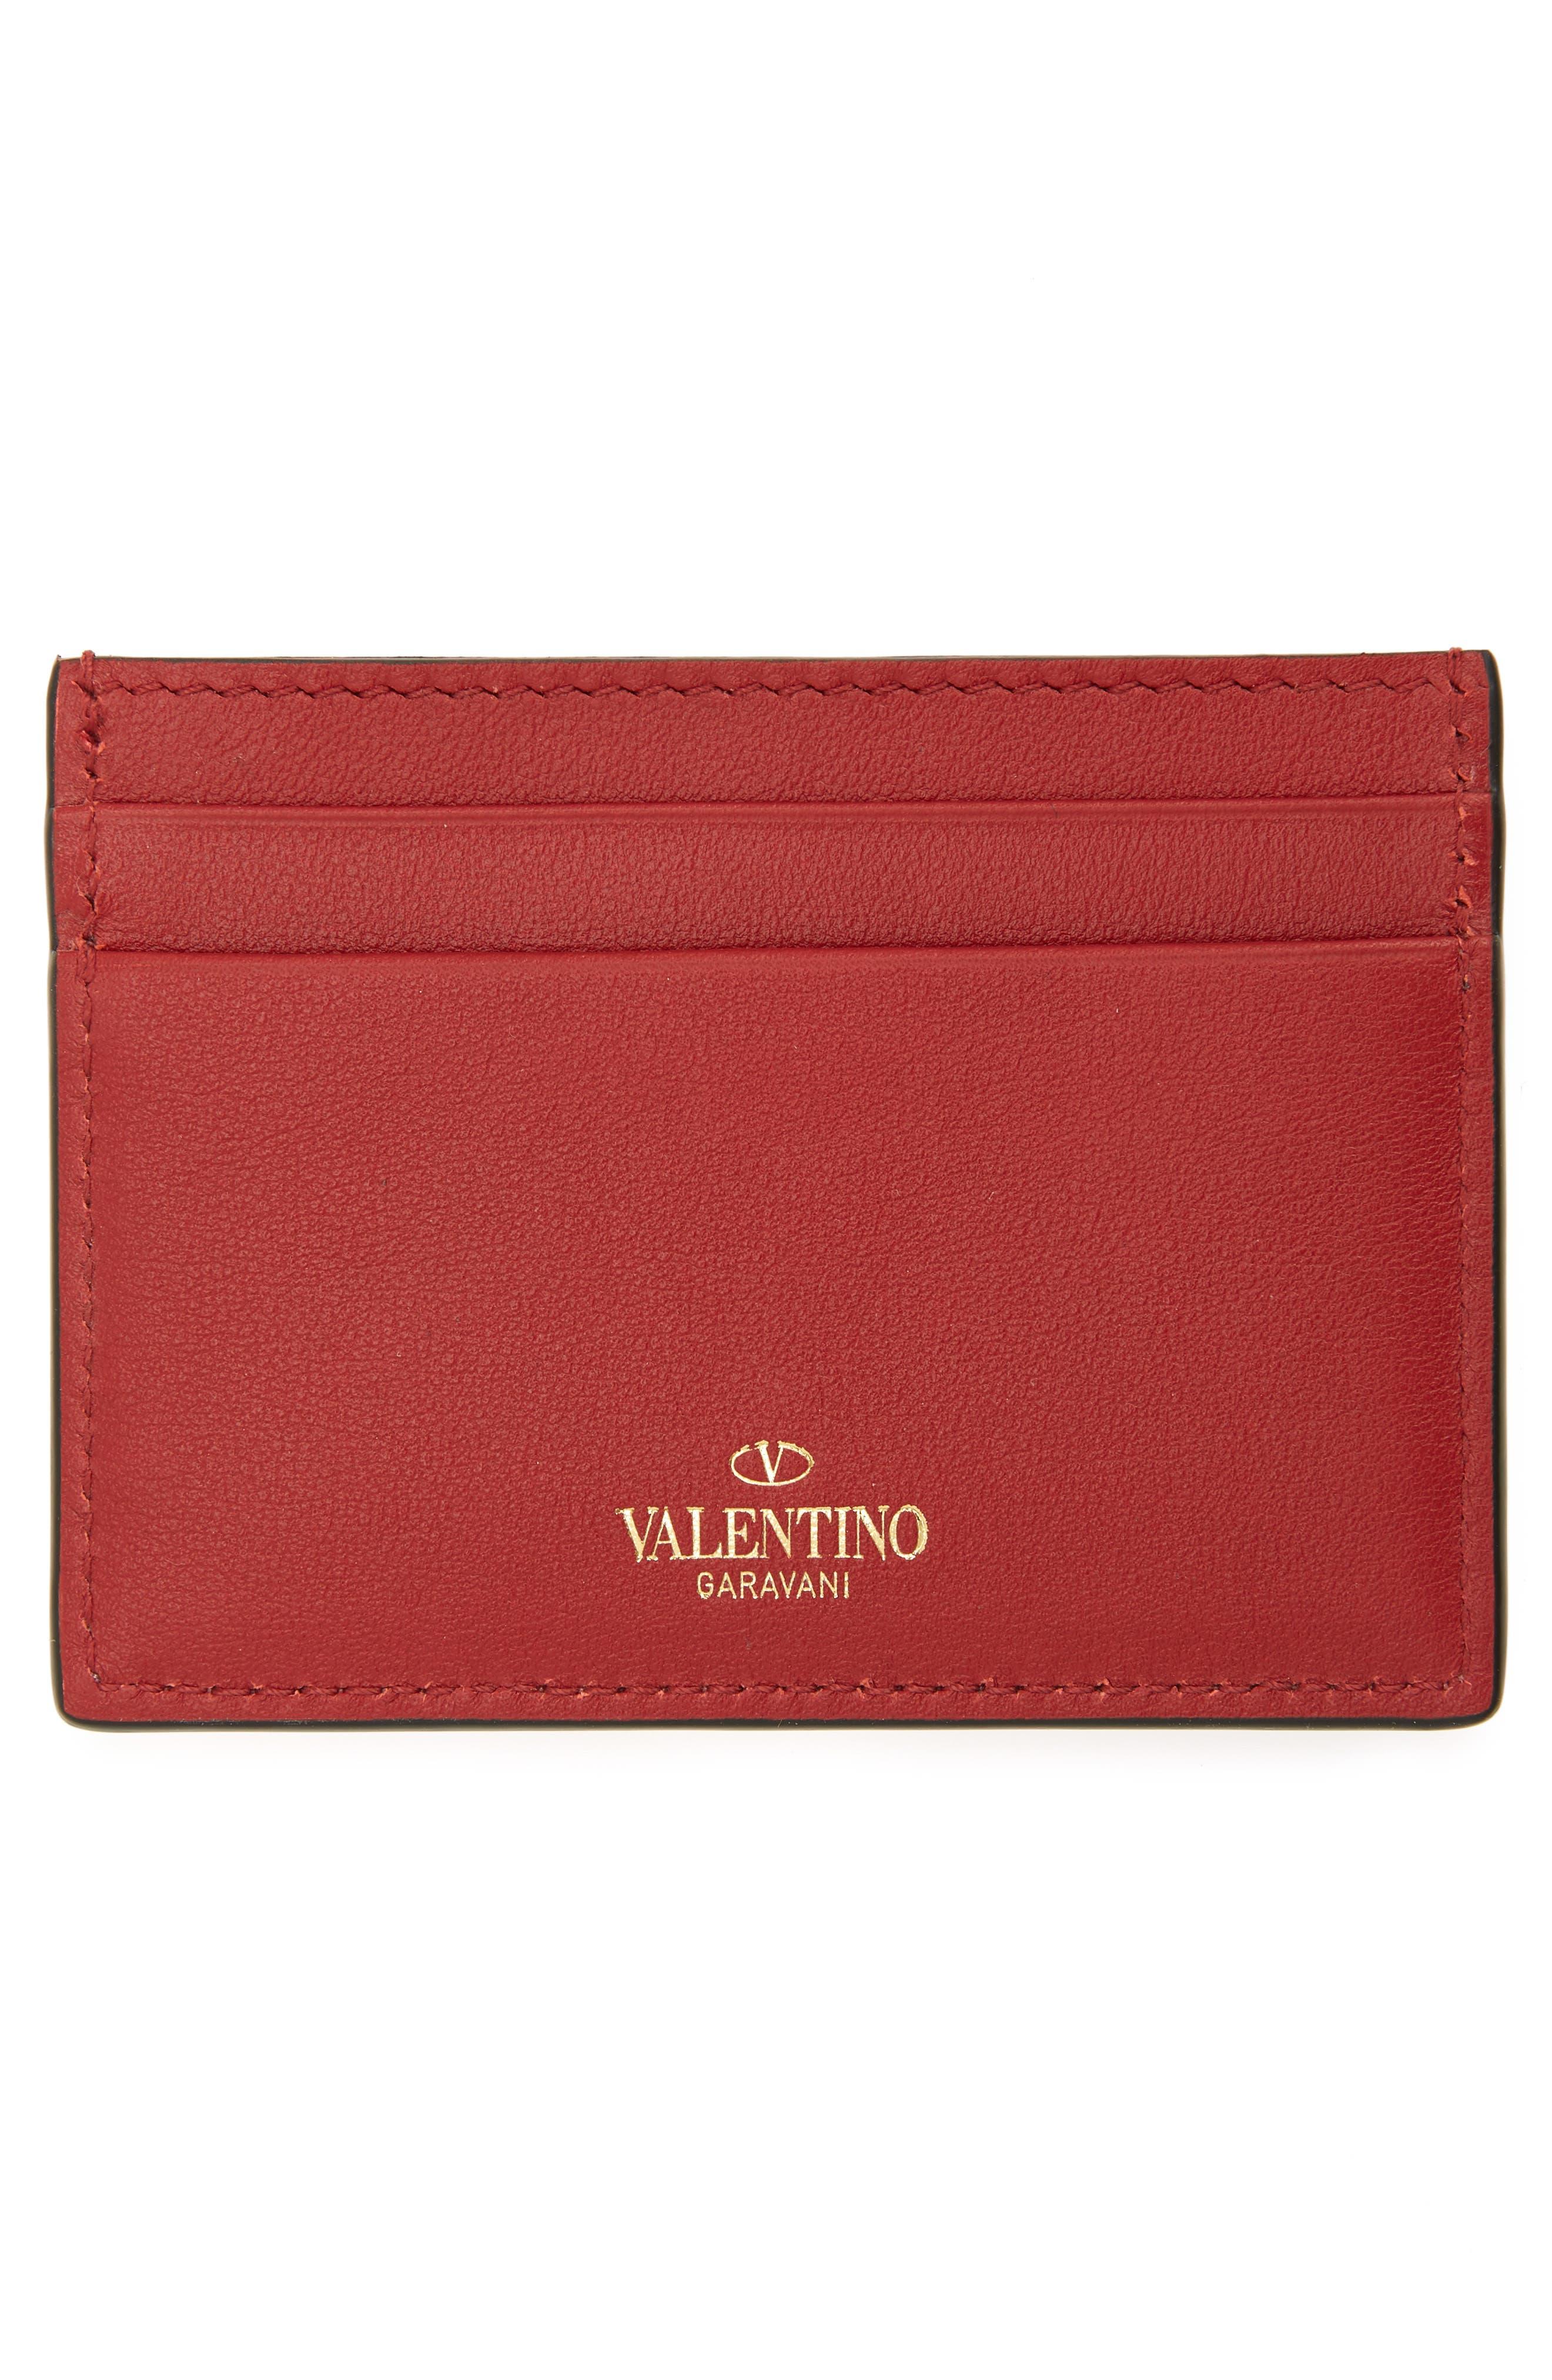 e159ebce103 Women s Designer Wallets   Accessories